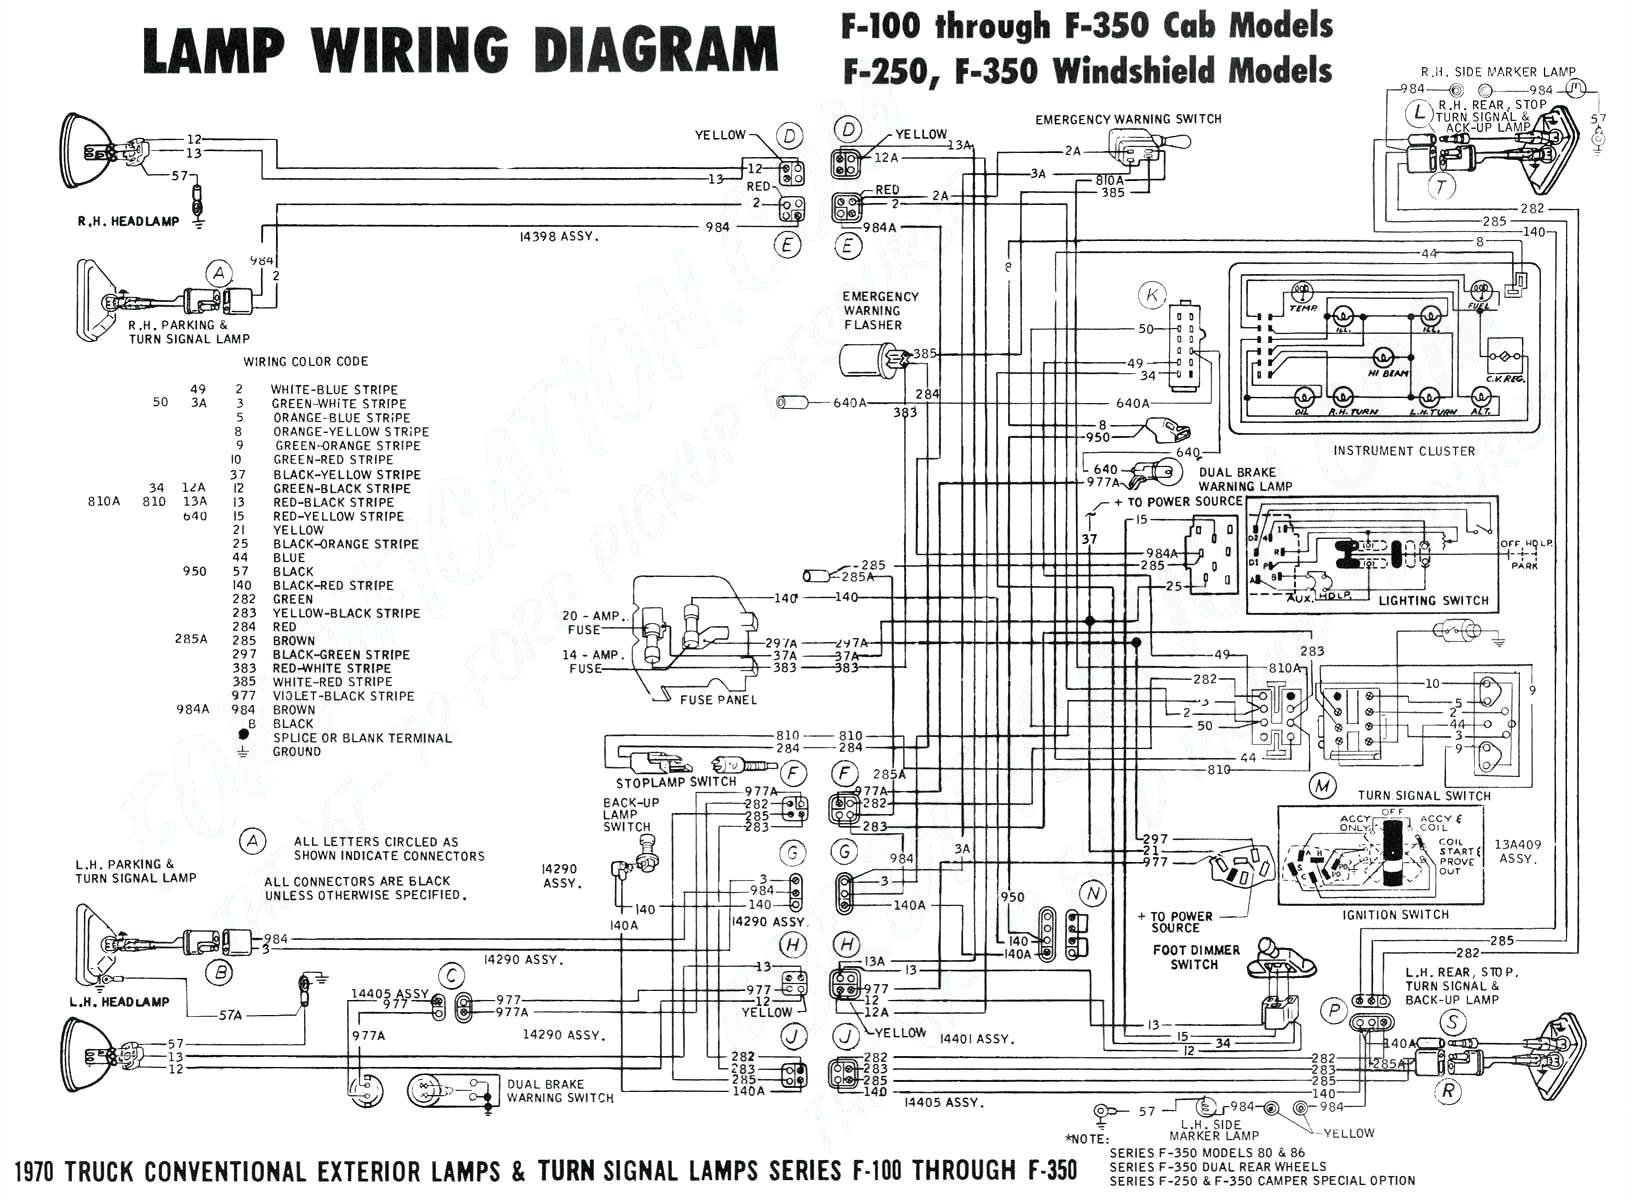 Wiring Diagram Jeep Grand Cherokee 2001 Jeep Cherokee Fuse Panel Diagram Wiring Diagram Mega